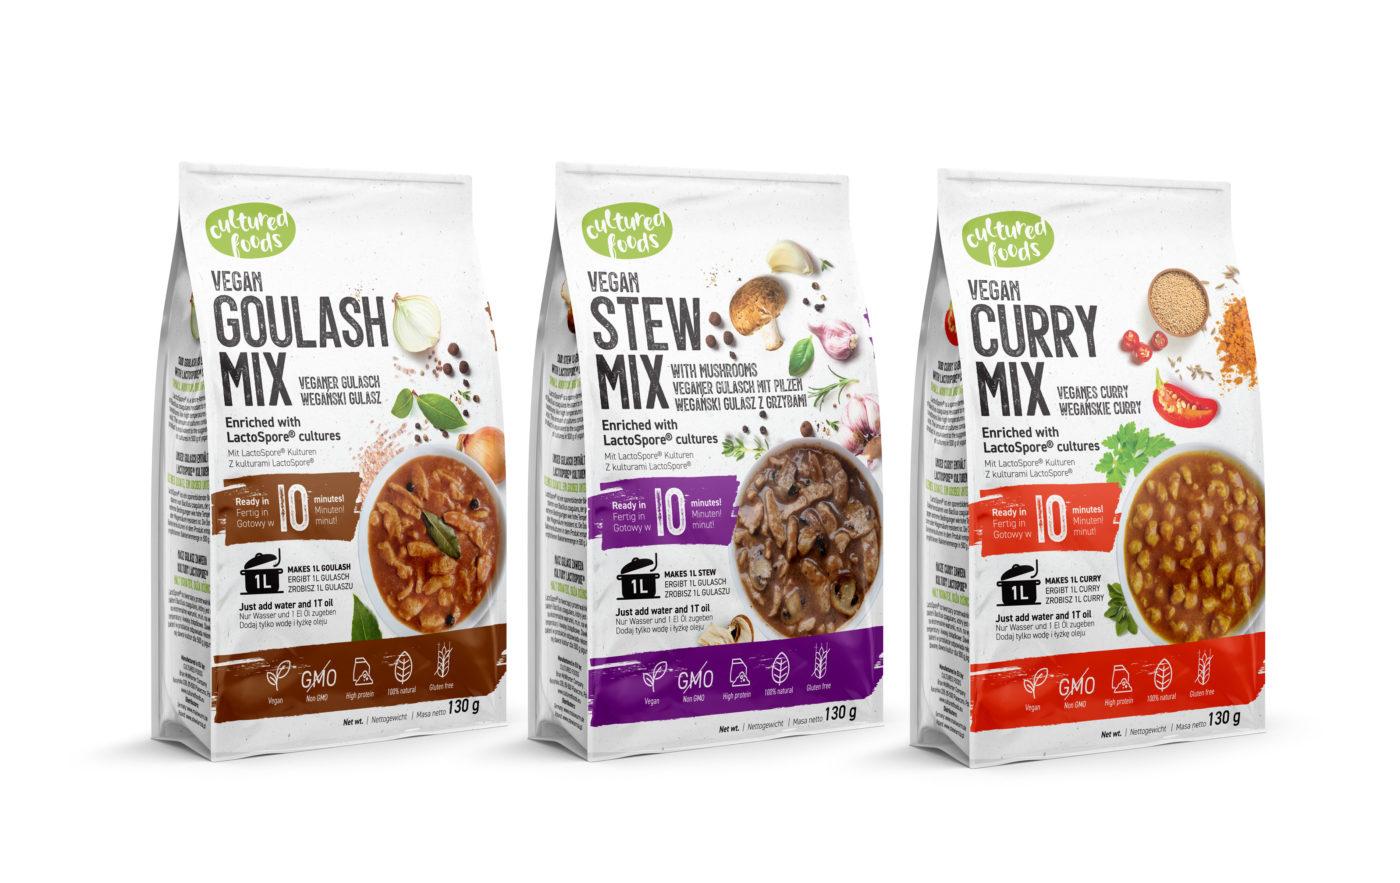 Projekt Cultured Foods